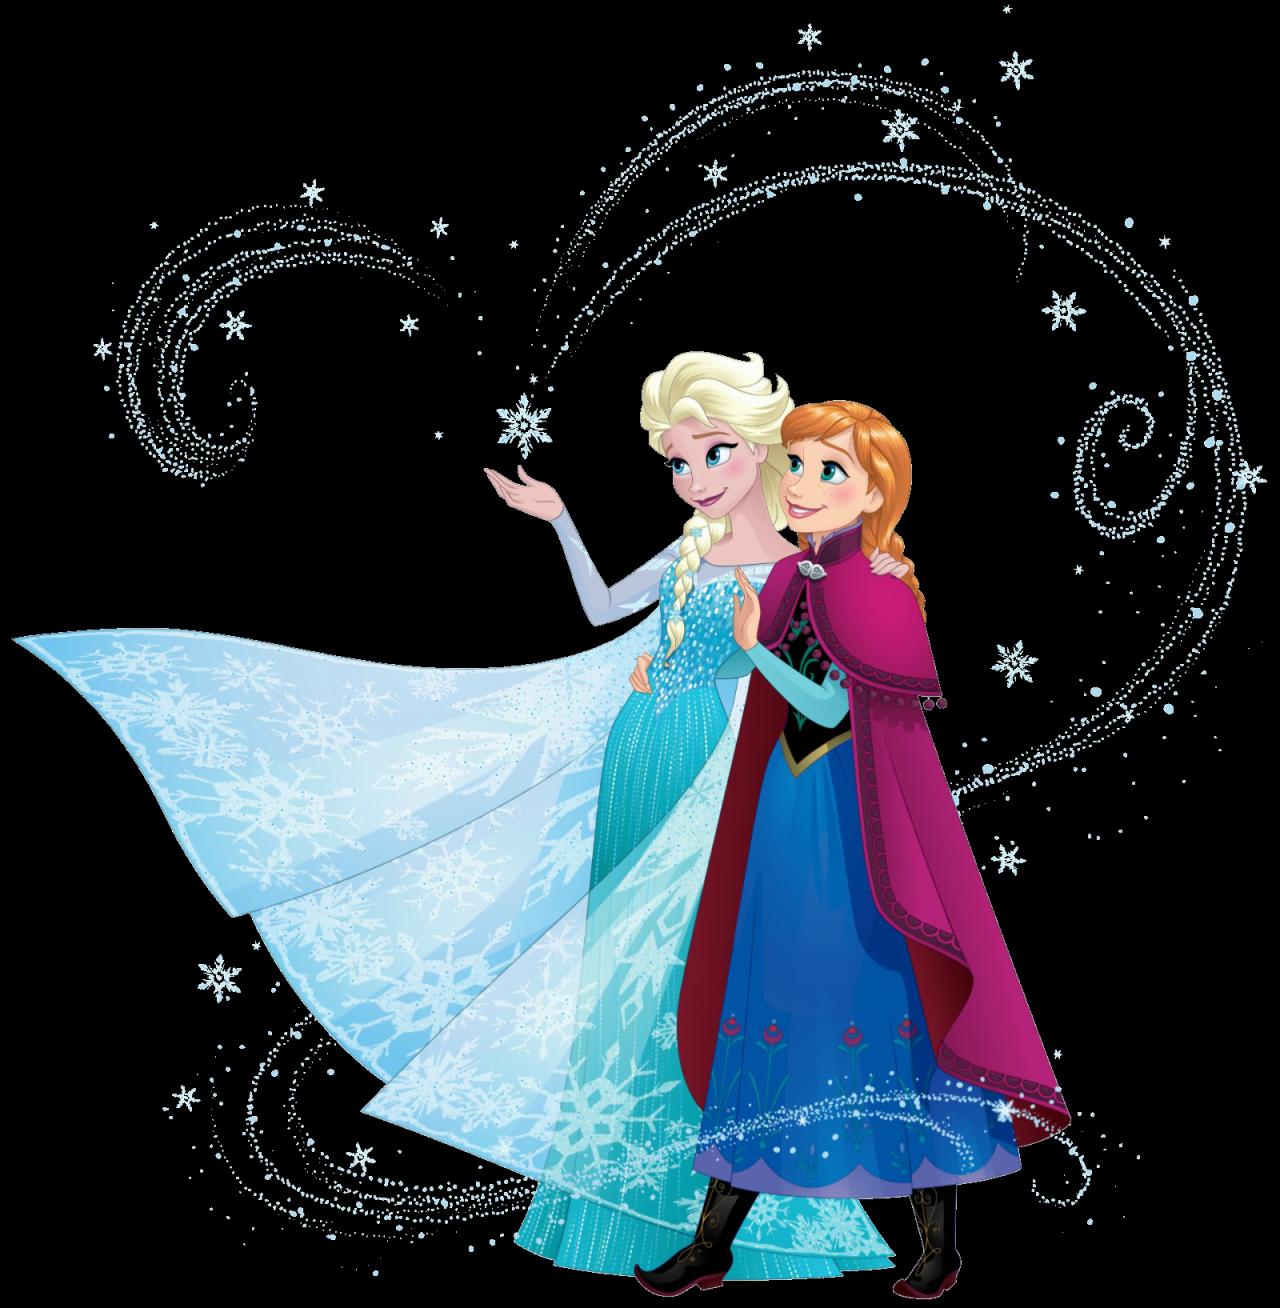 Anna and Elsa with snow magic Disney princess wallpaper